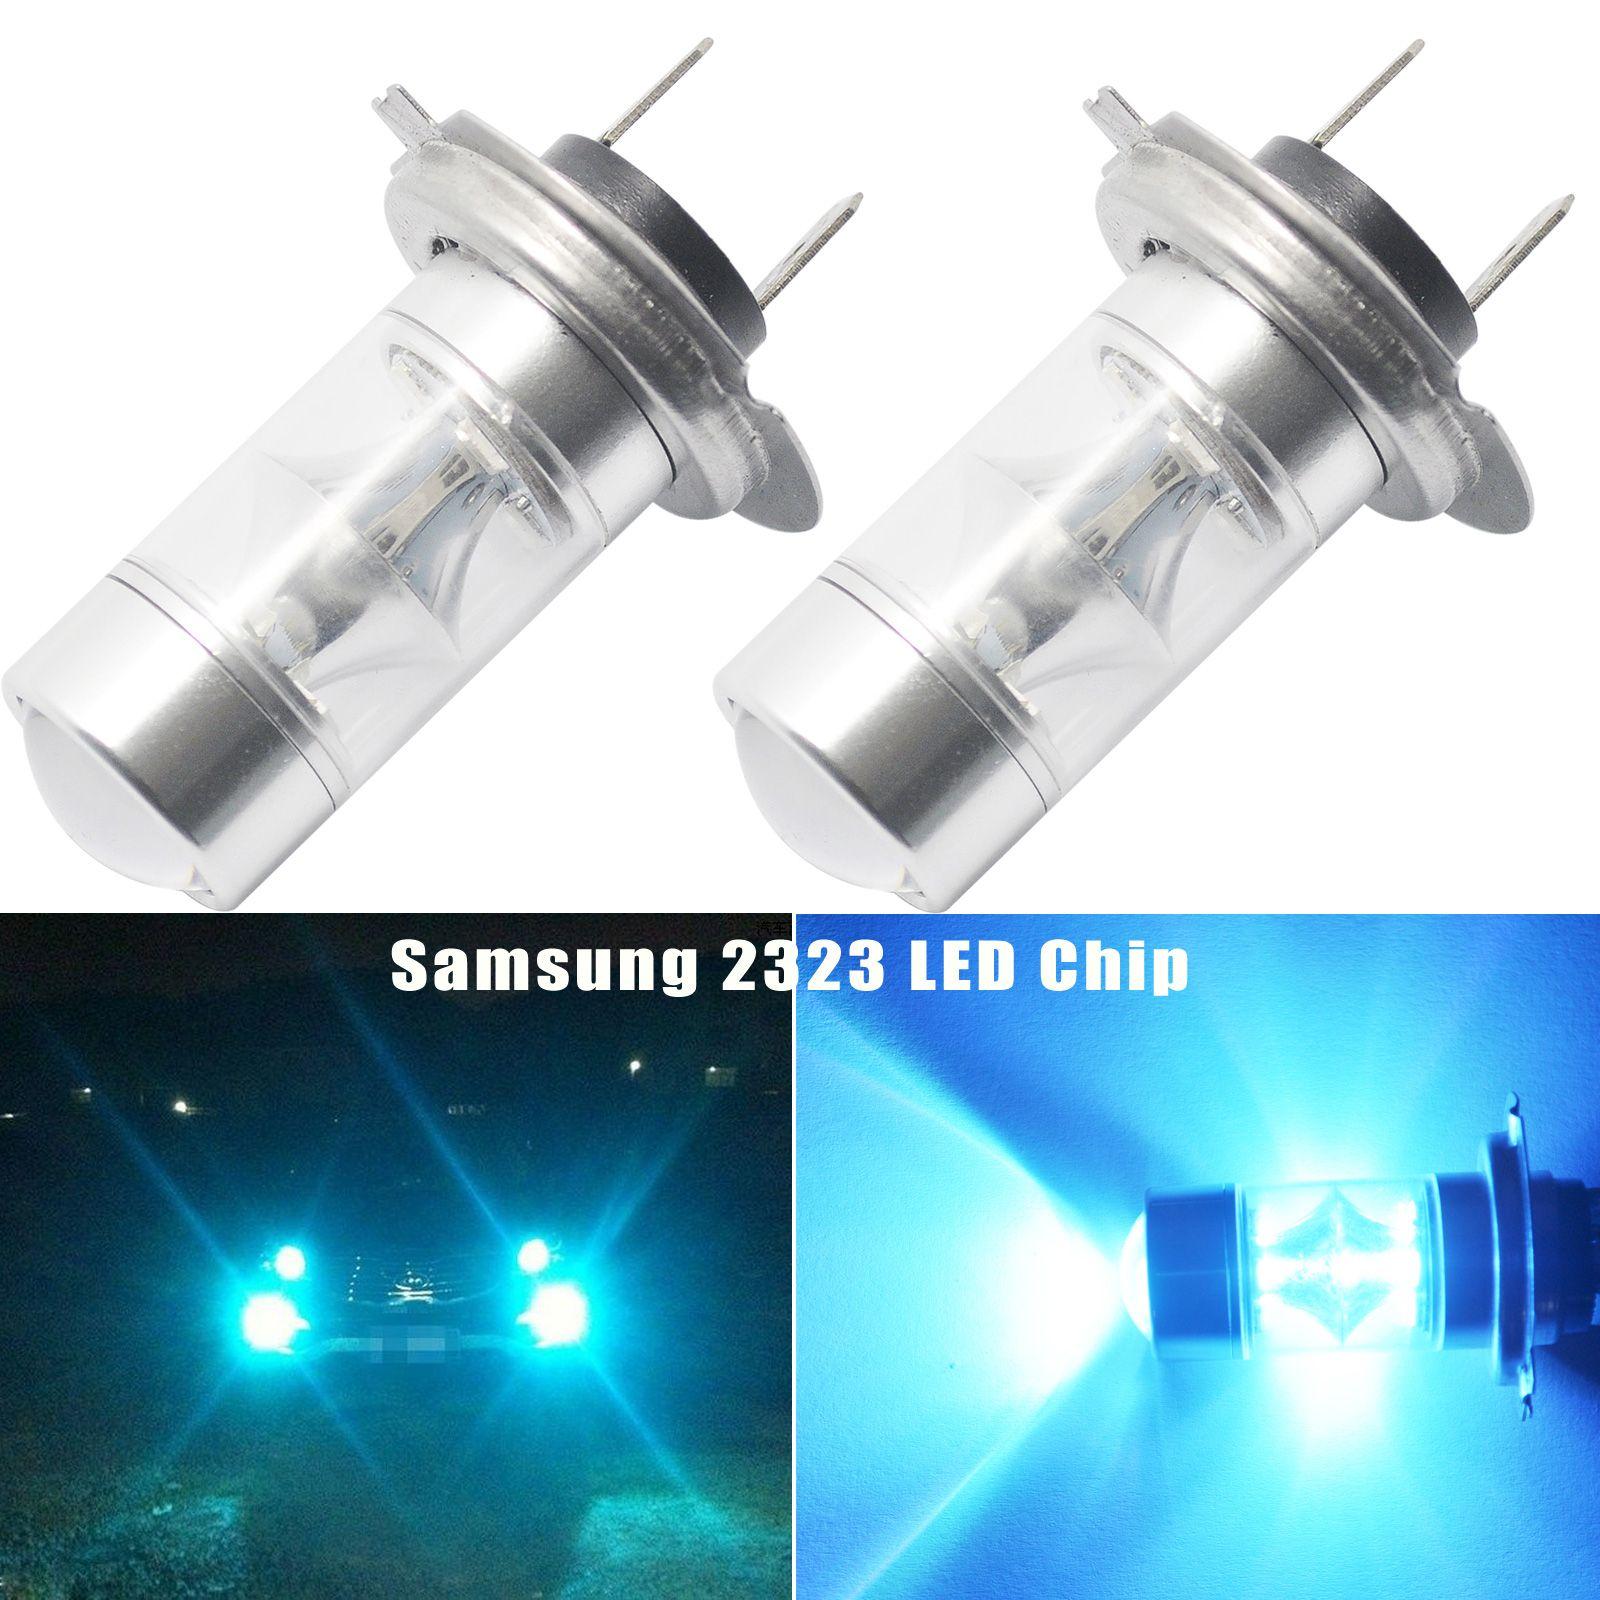 2pcs Car H7 Car 8000K Ice Blue 60W Car 2323 LED Fog Light 12-SMD Driving Bulbs DRL